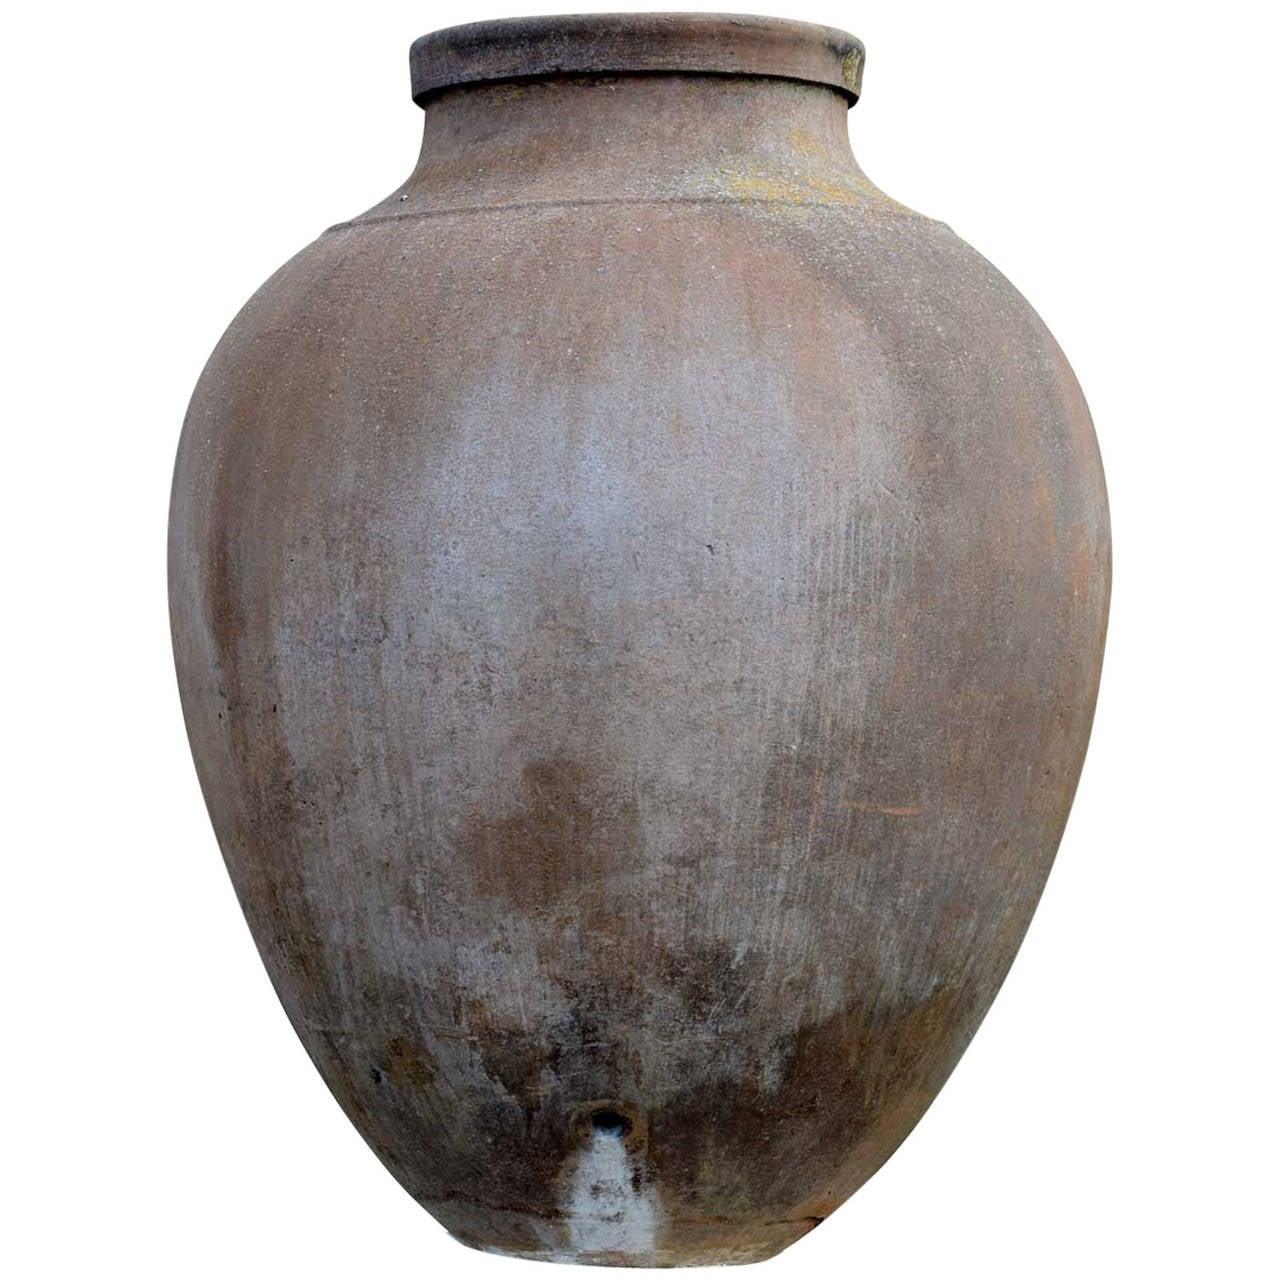 Terracotta Olive Oil Jar, 19th Century